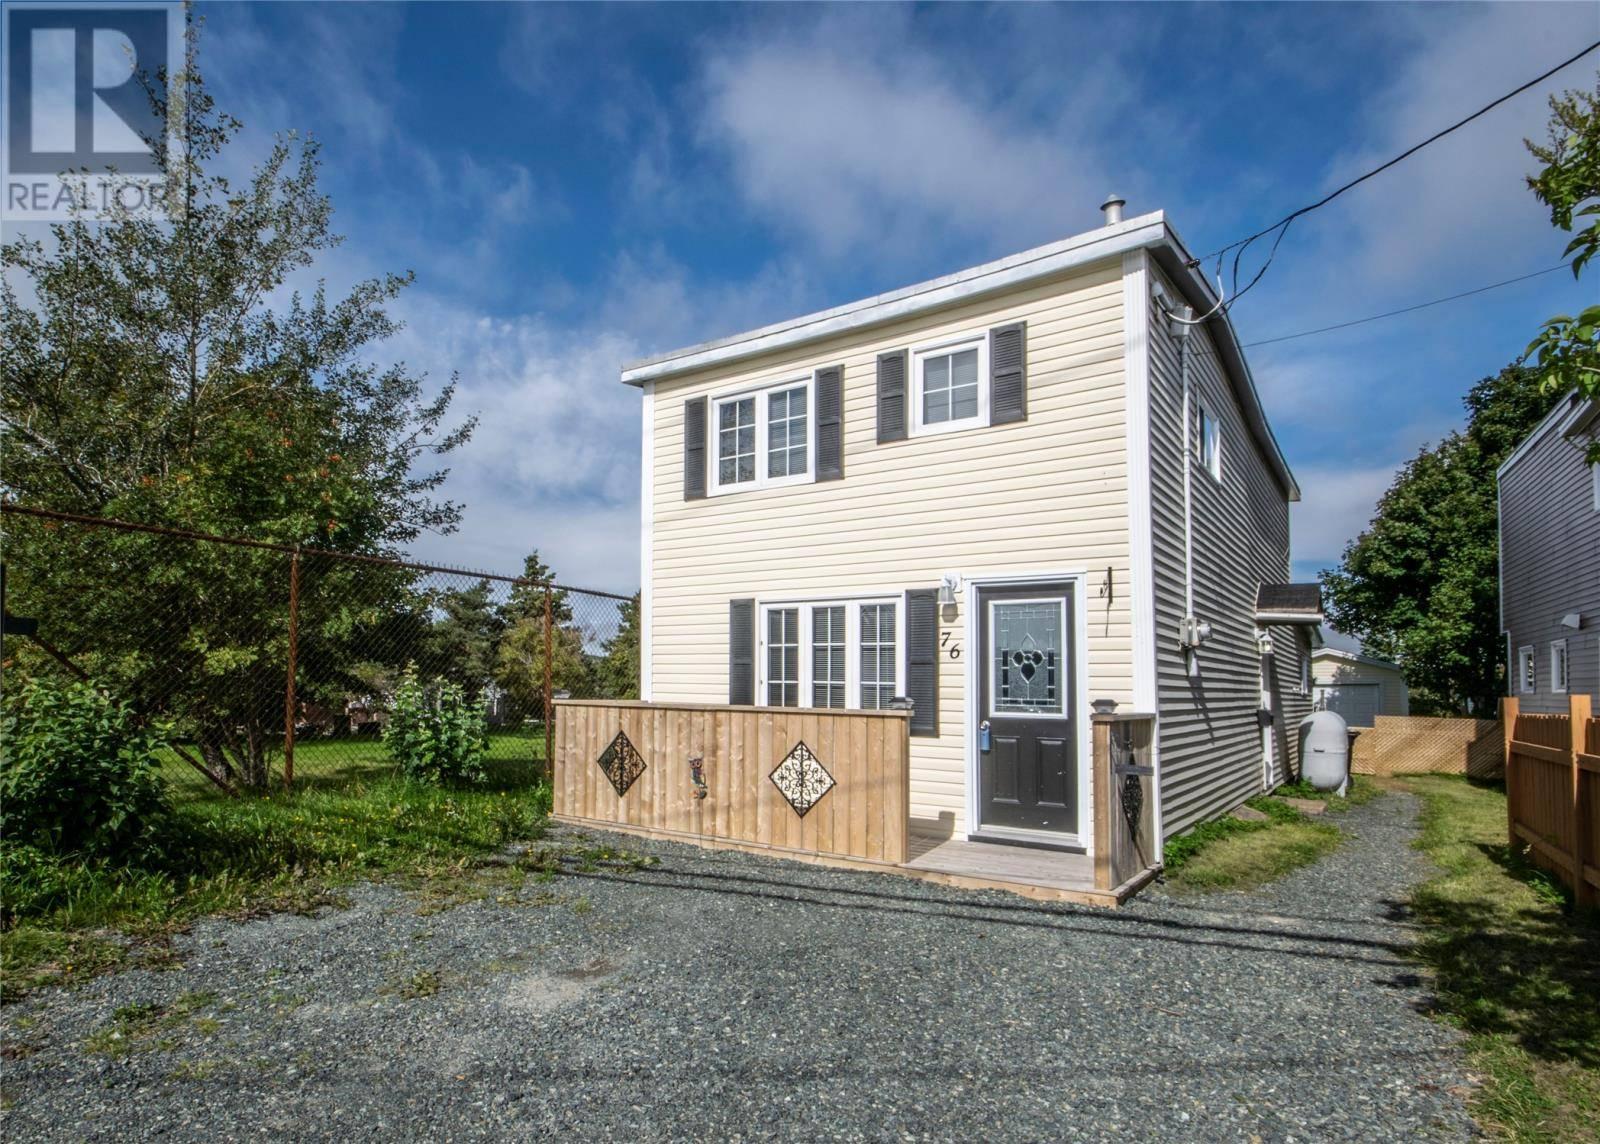 House for sale at 76 Blackmarsh Rd St. John's Newfoundland - MLS: 1209124